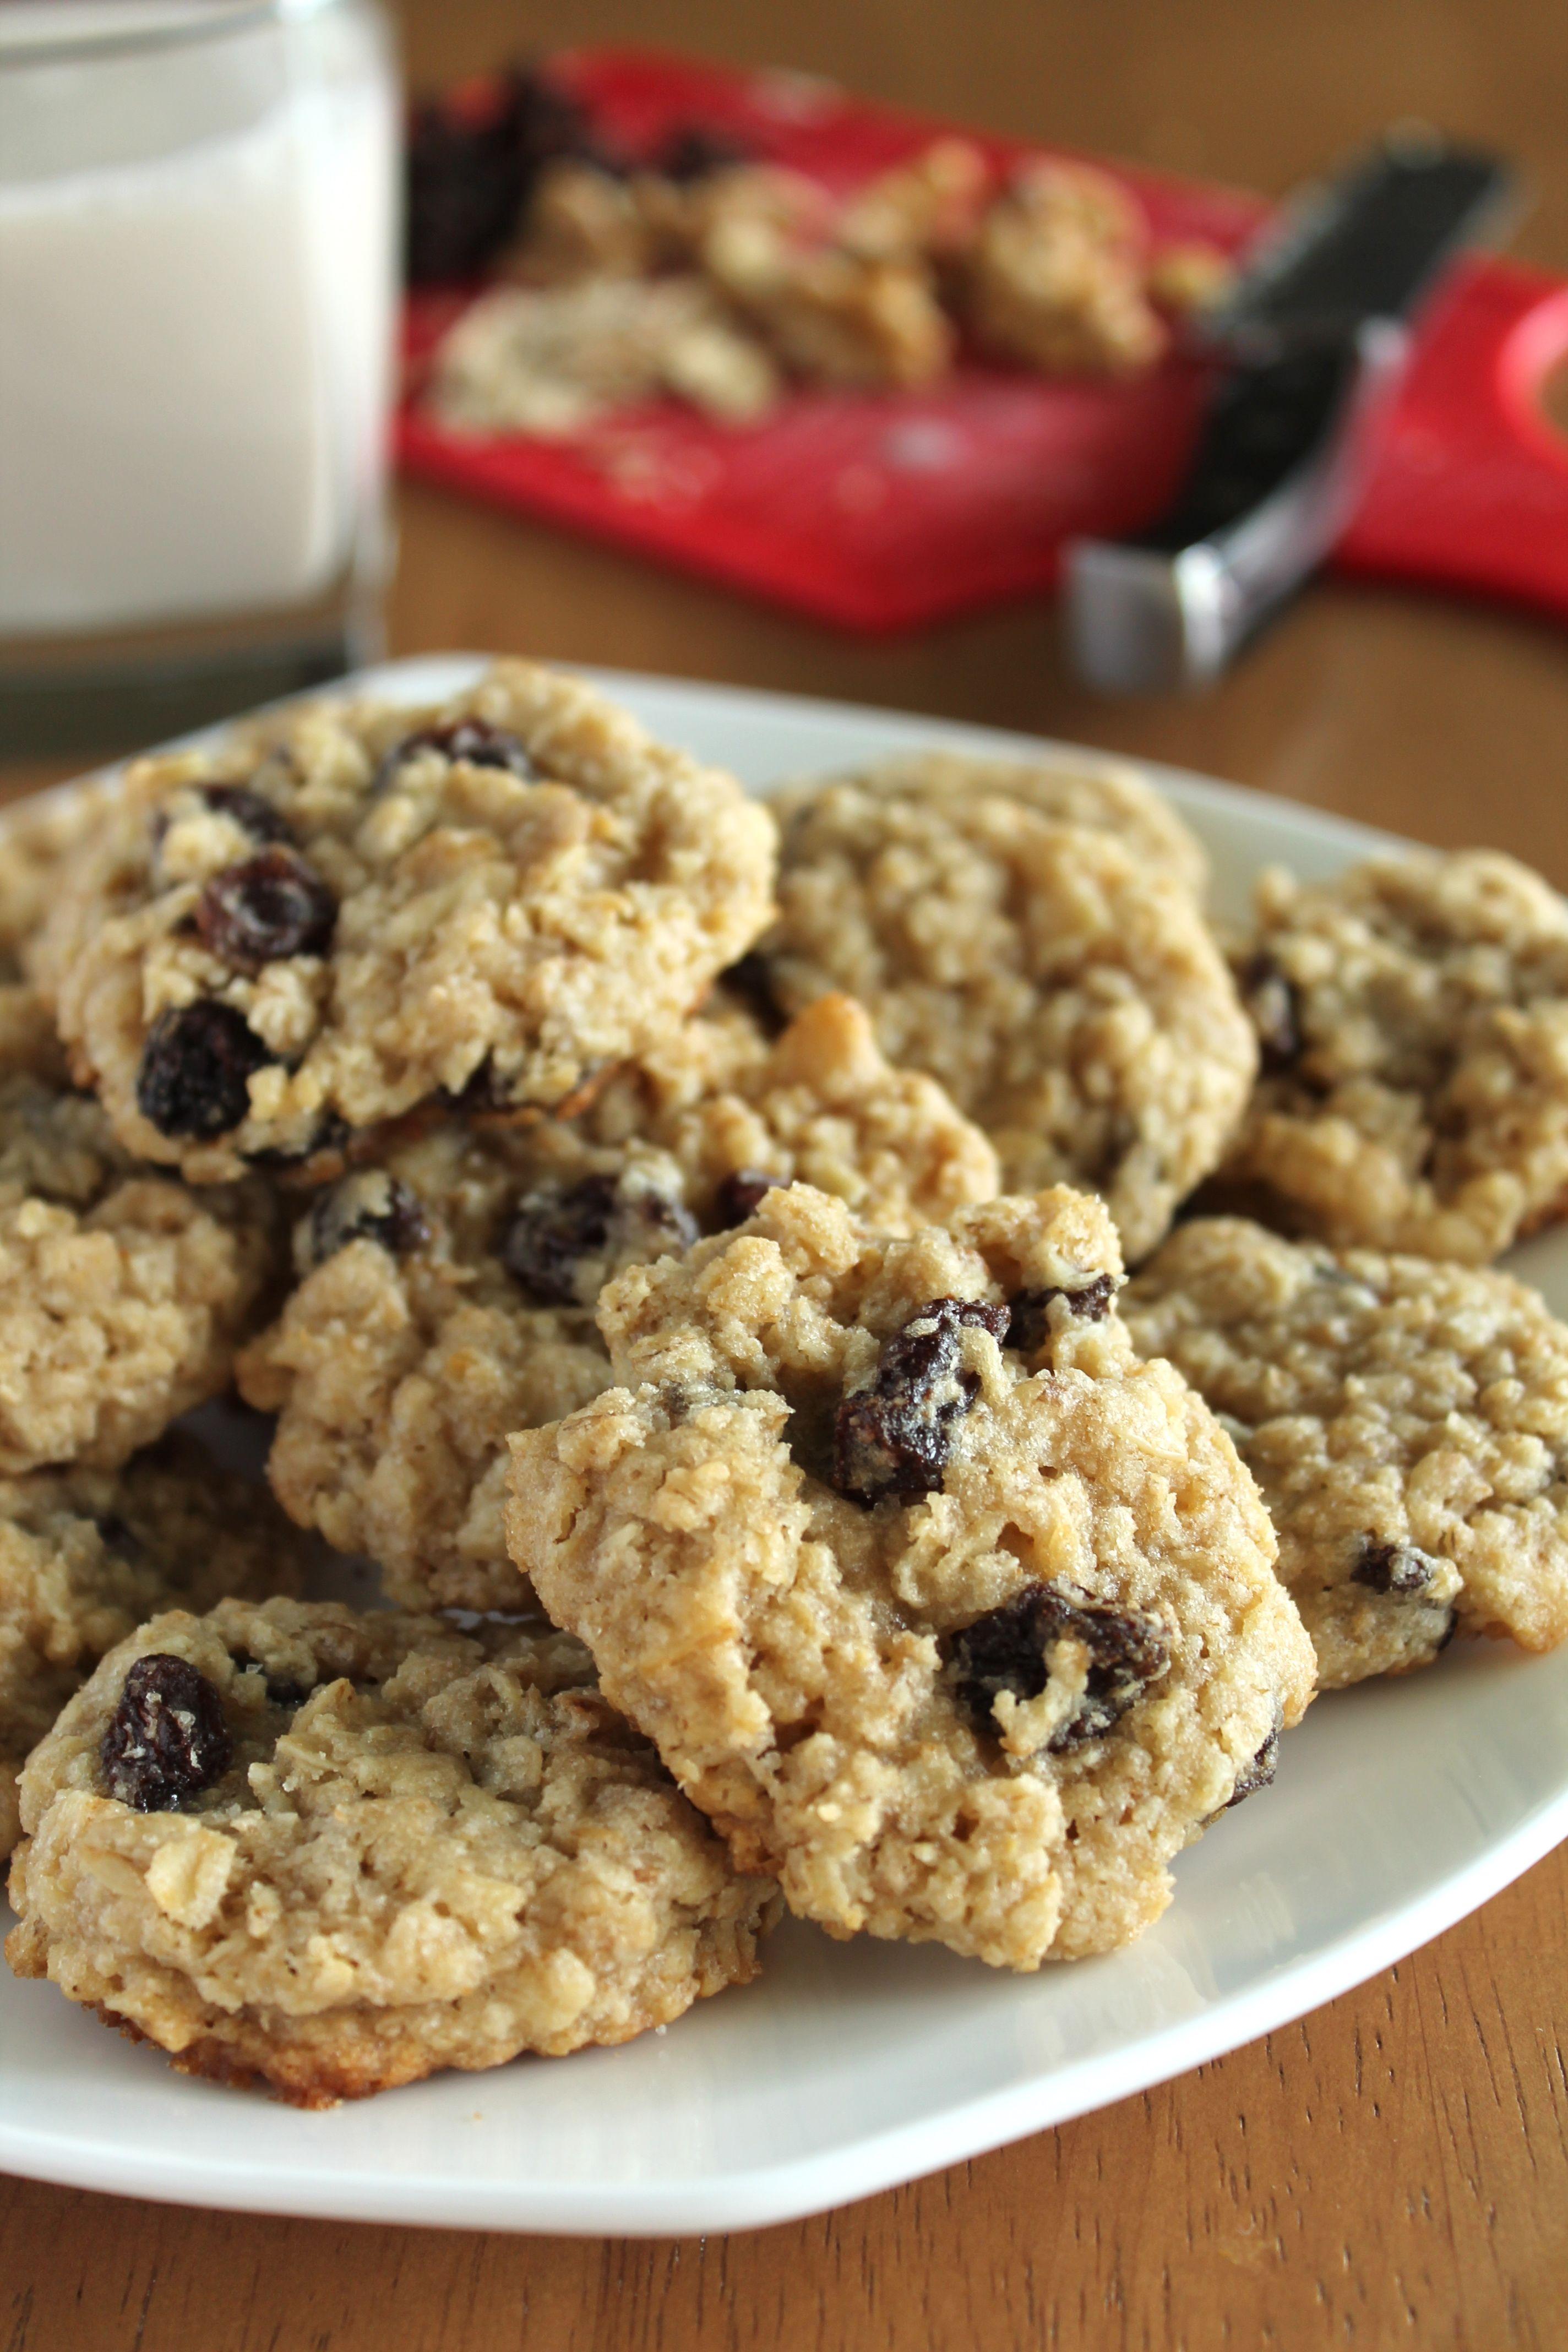 Vegan Oatmeal Raisin Cookies Recipe Vegan Oatmeal Raisin Cookies Vegan Oatmeal Cookies Raisin Cookies